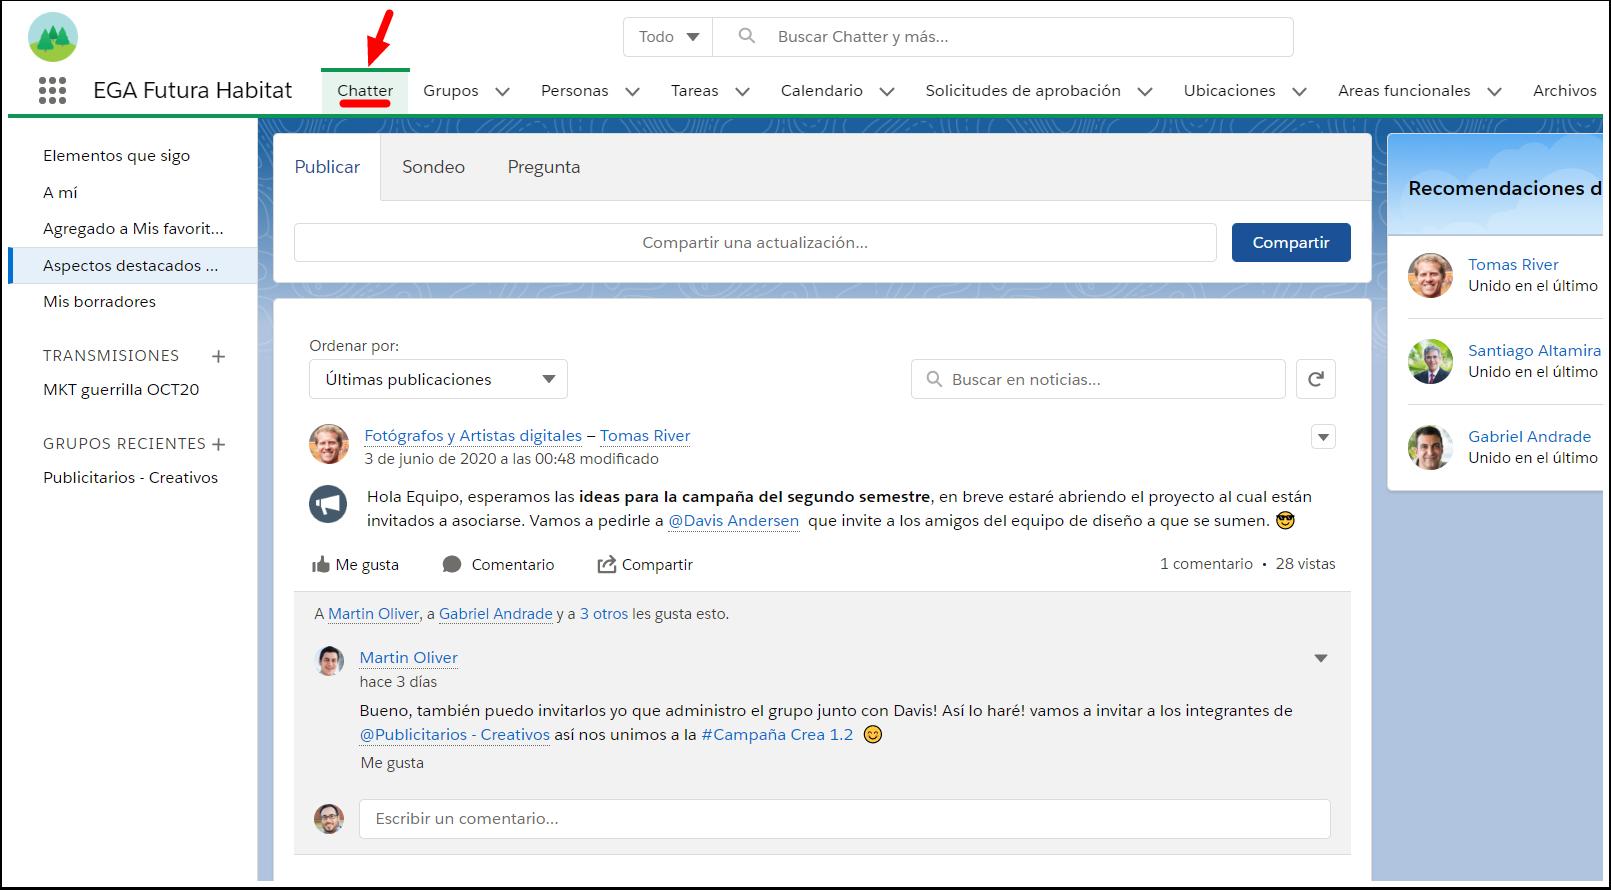 Acceso pagina ficha Chatter EGA聽Futura Habitat ERP nube